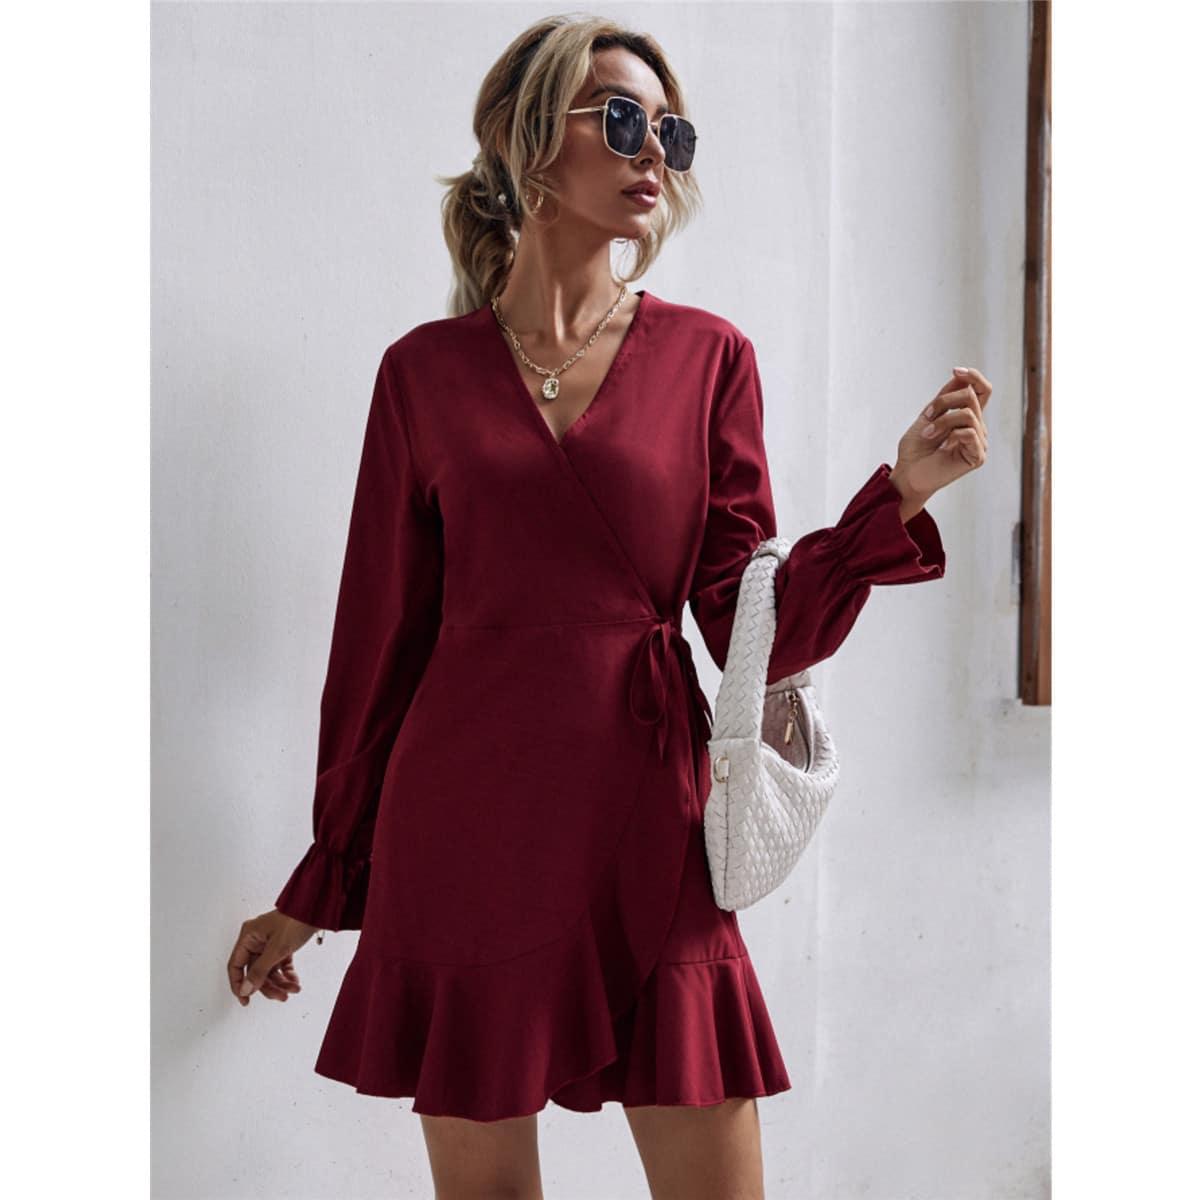 Платье с воланами на рукавах SheIn swdress23210617599